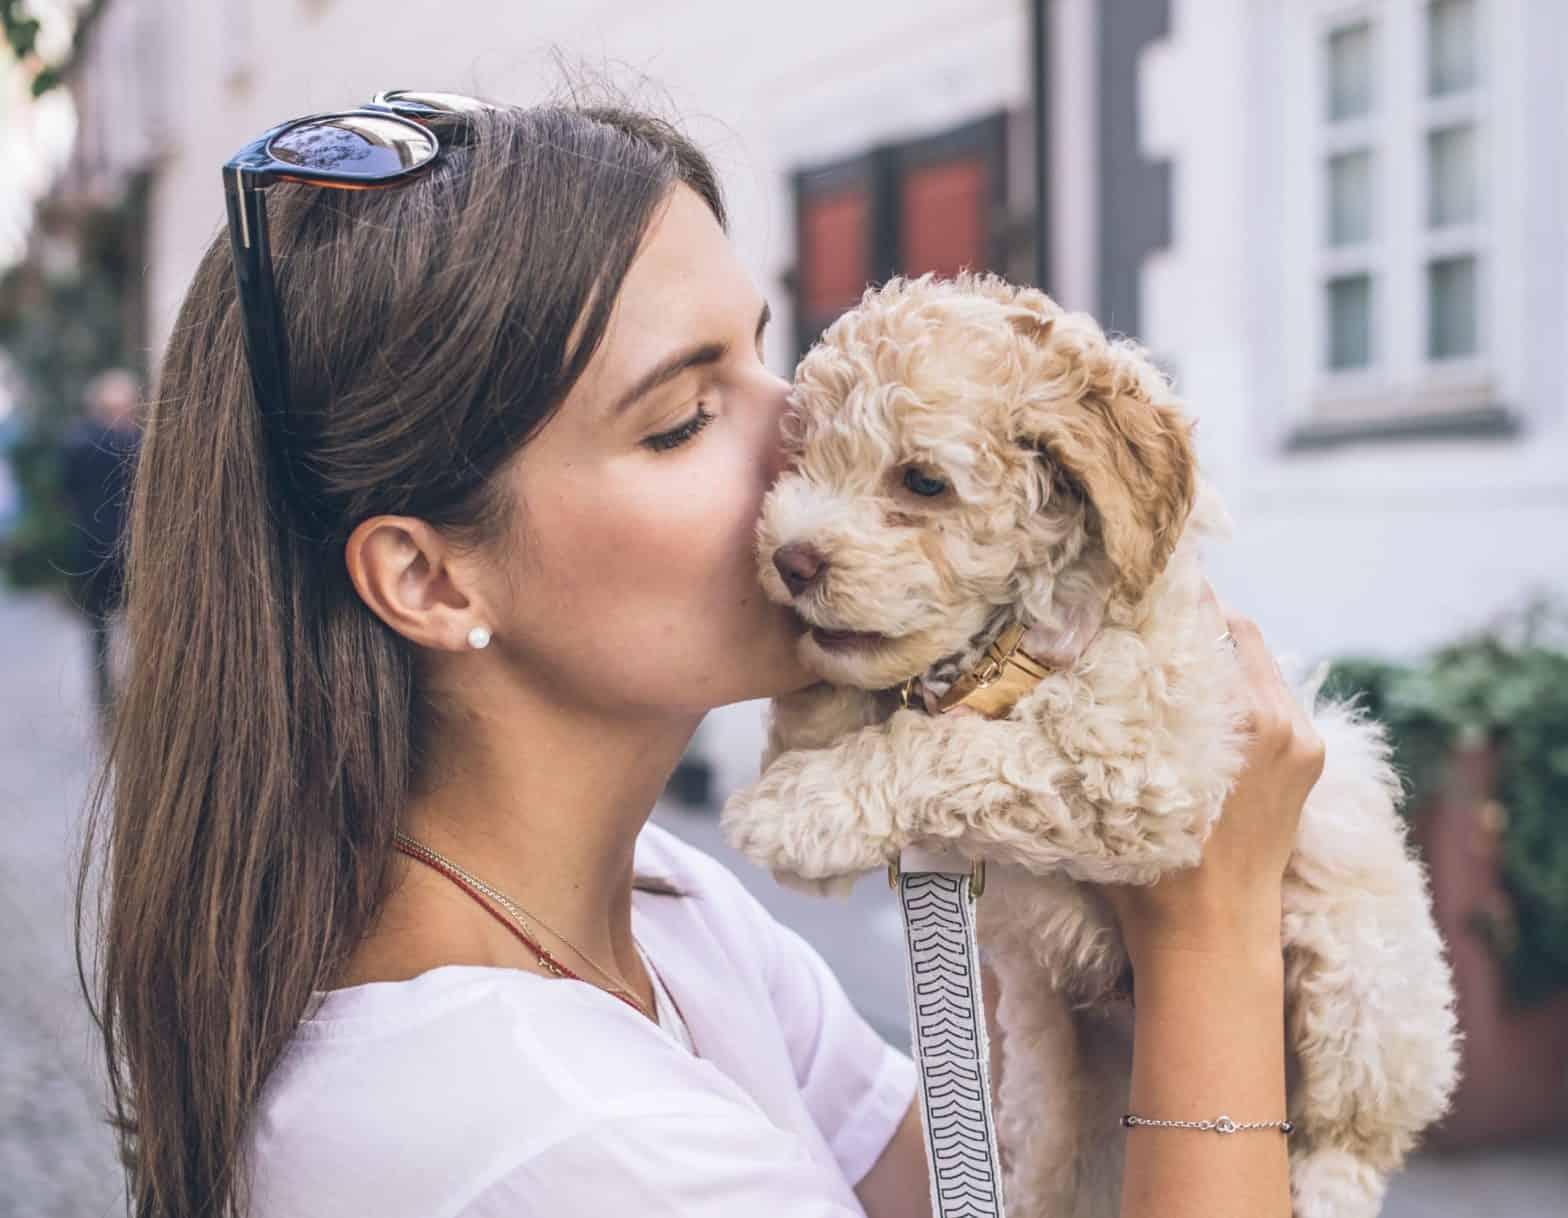 Meisje met zonnebril die haar pup knuffelt.